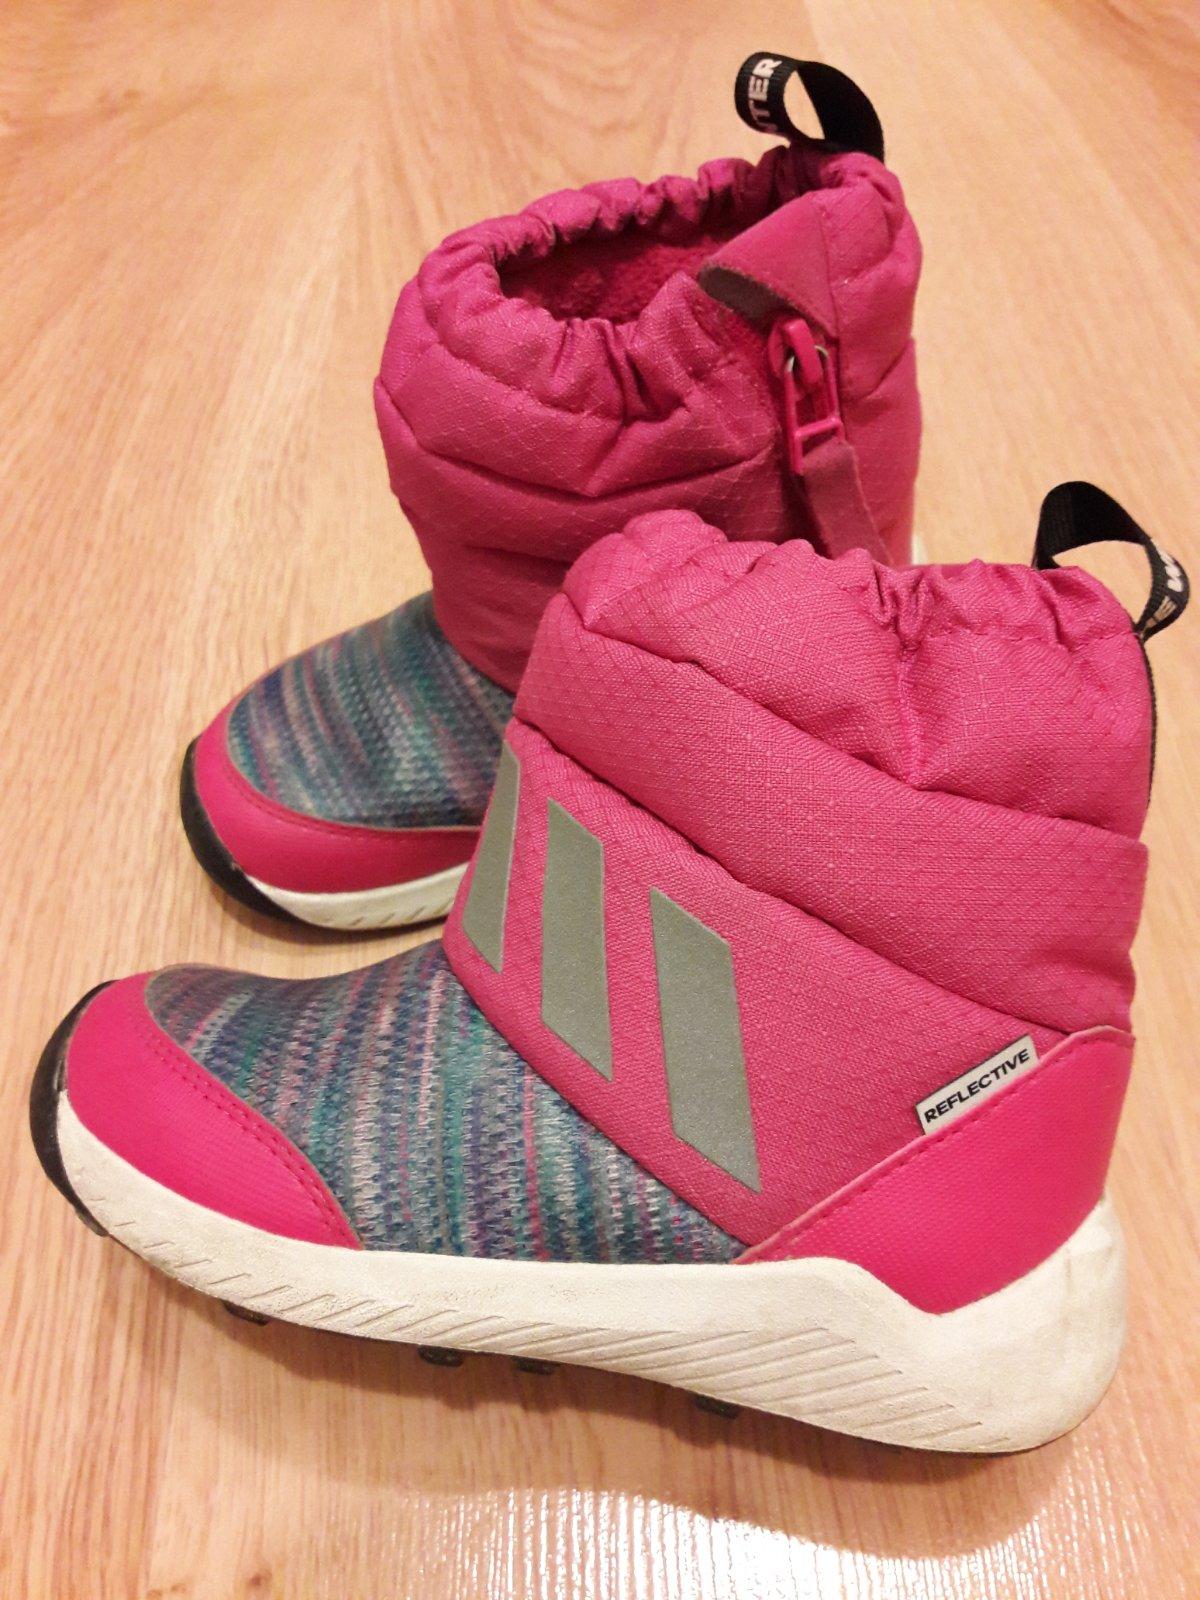 a0071bce90bb Snehule adidas rapidasnow beat the winter 26